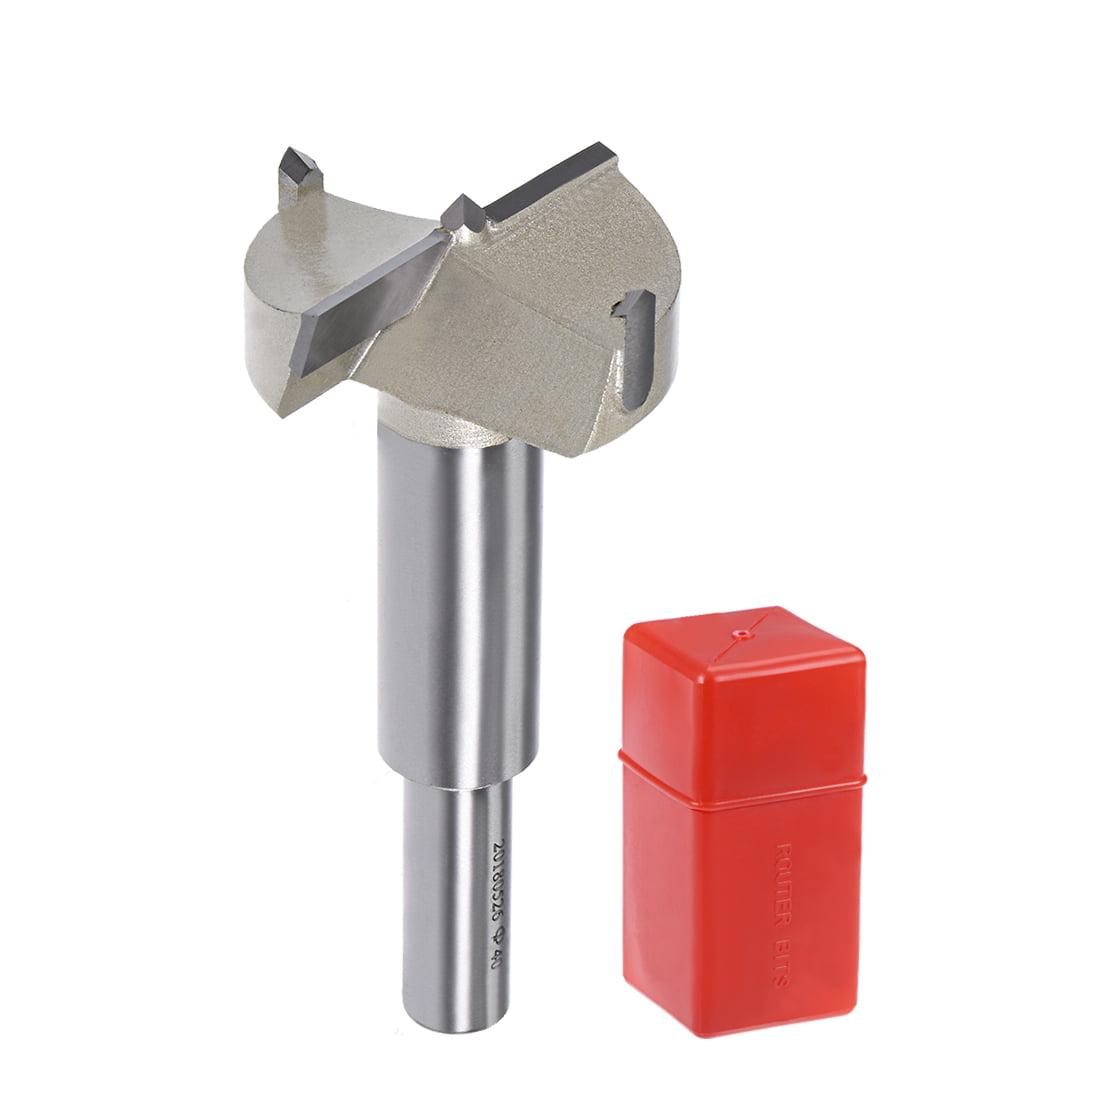 Forstner Drill Bit 40mm Diameter 10mm x 30mm Shank